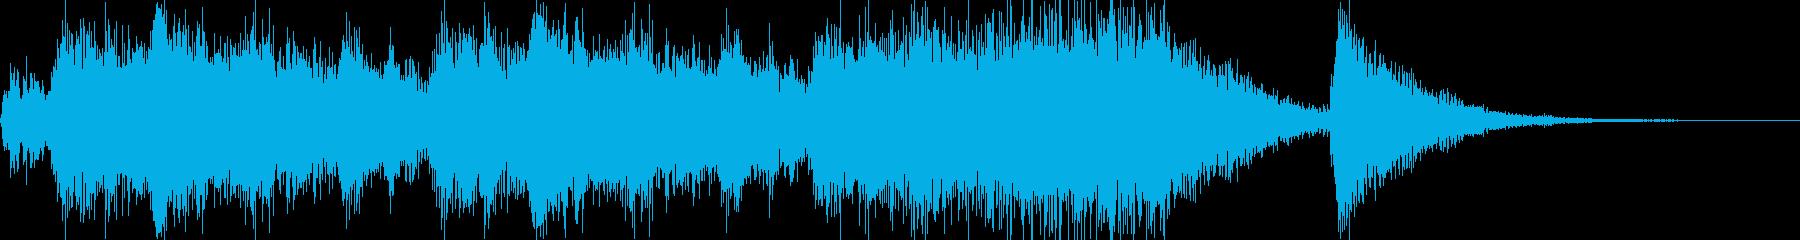 CM明けの明るいジングルの再生済みの波形